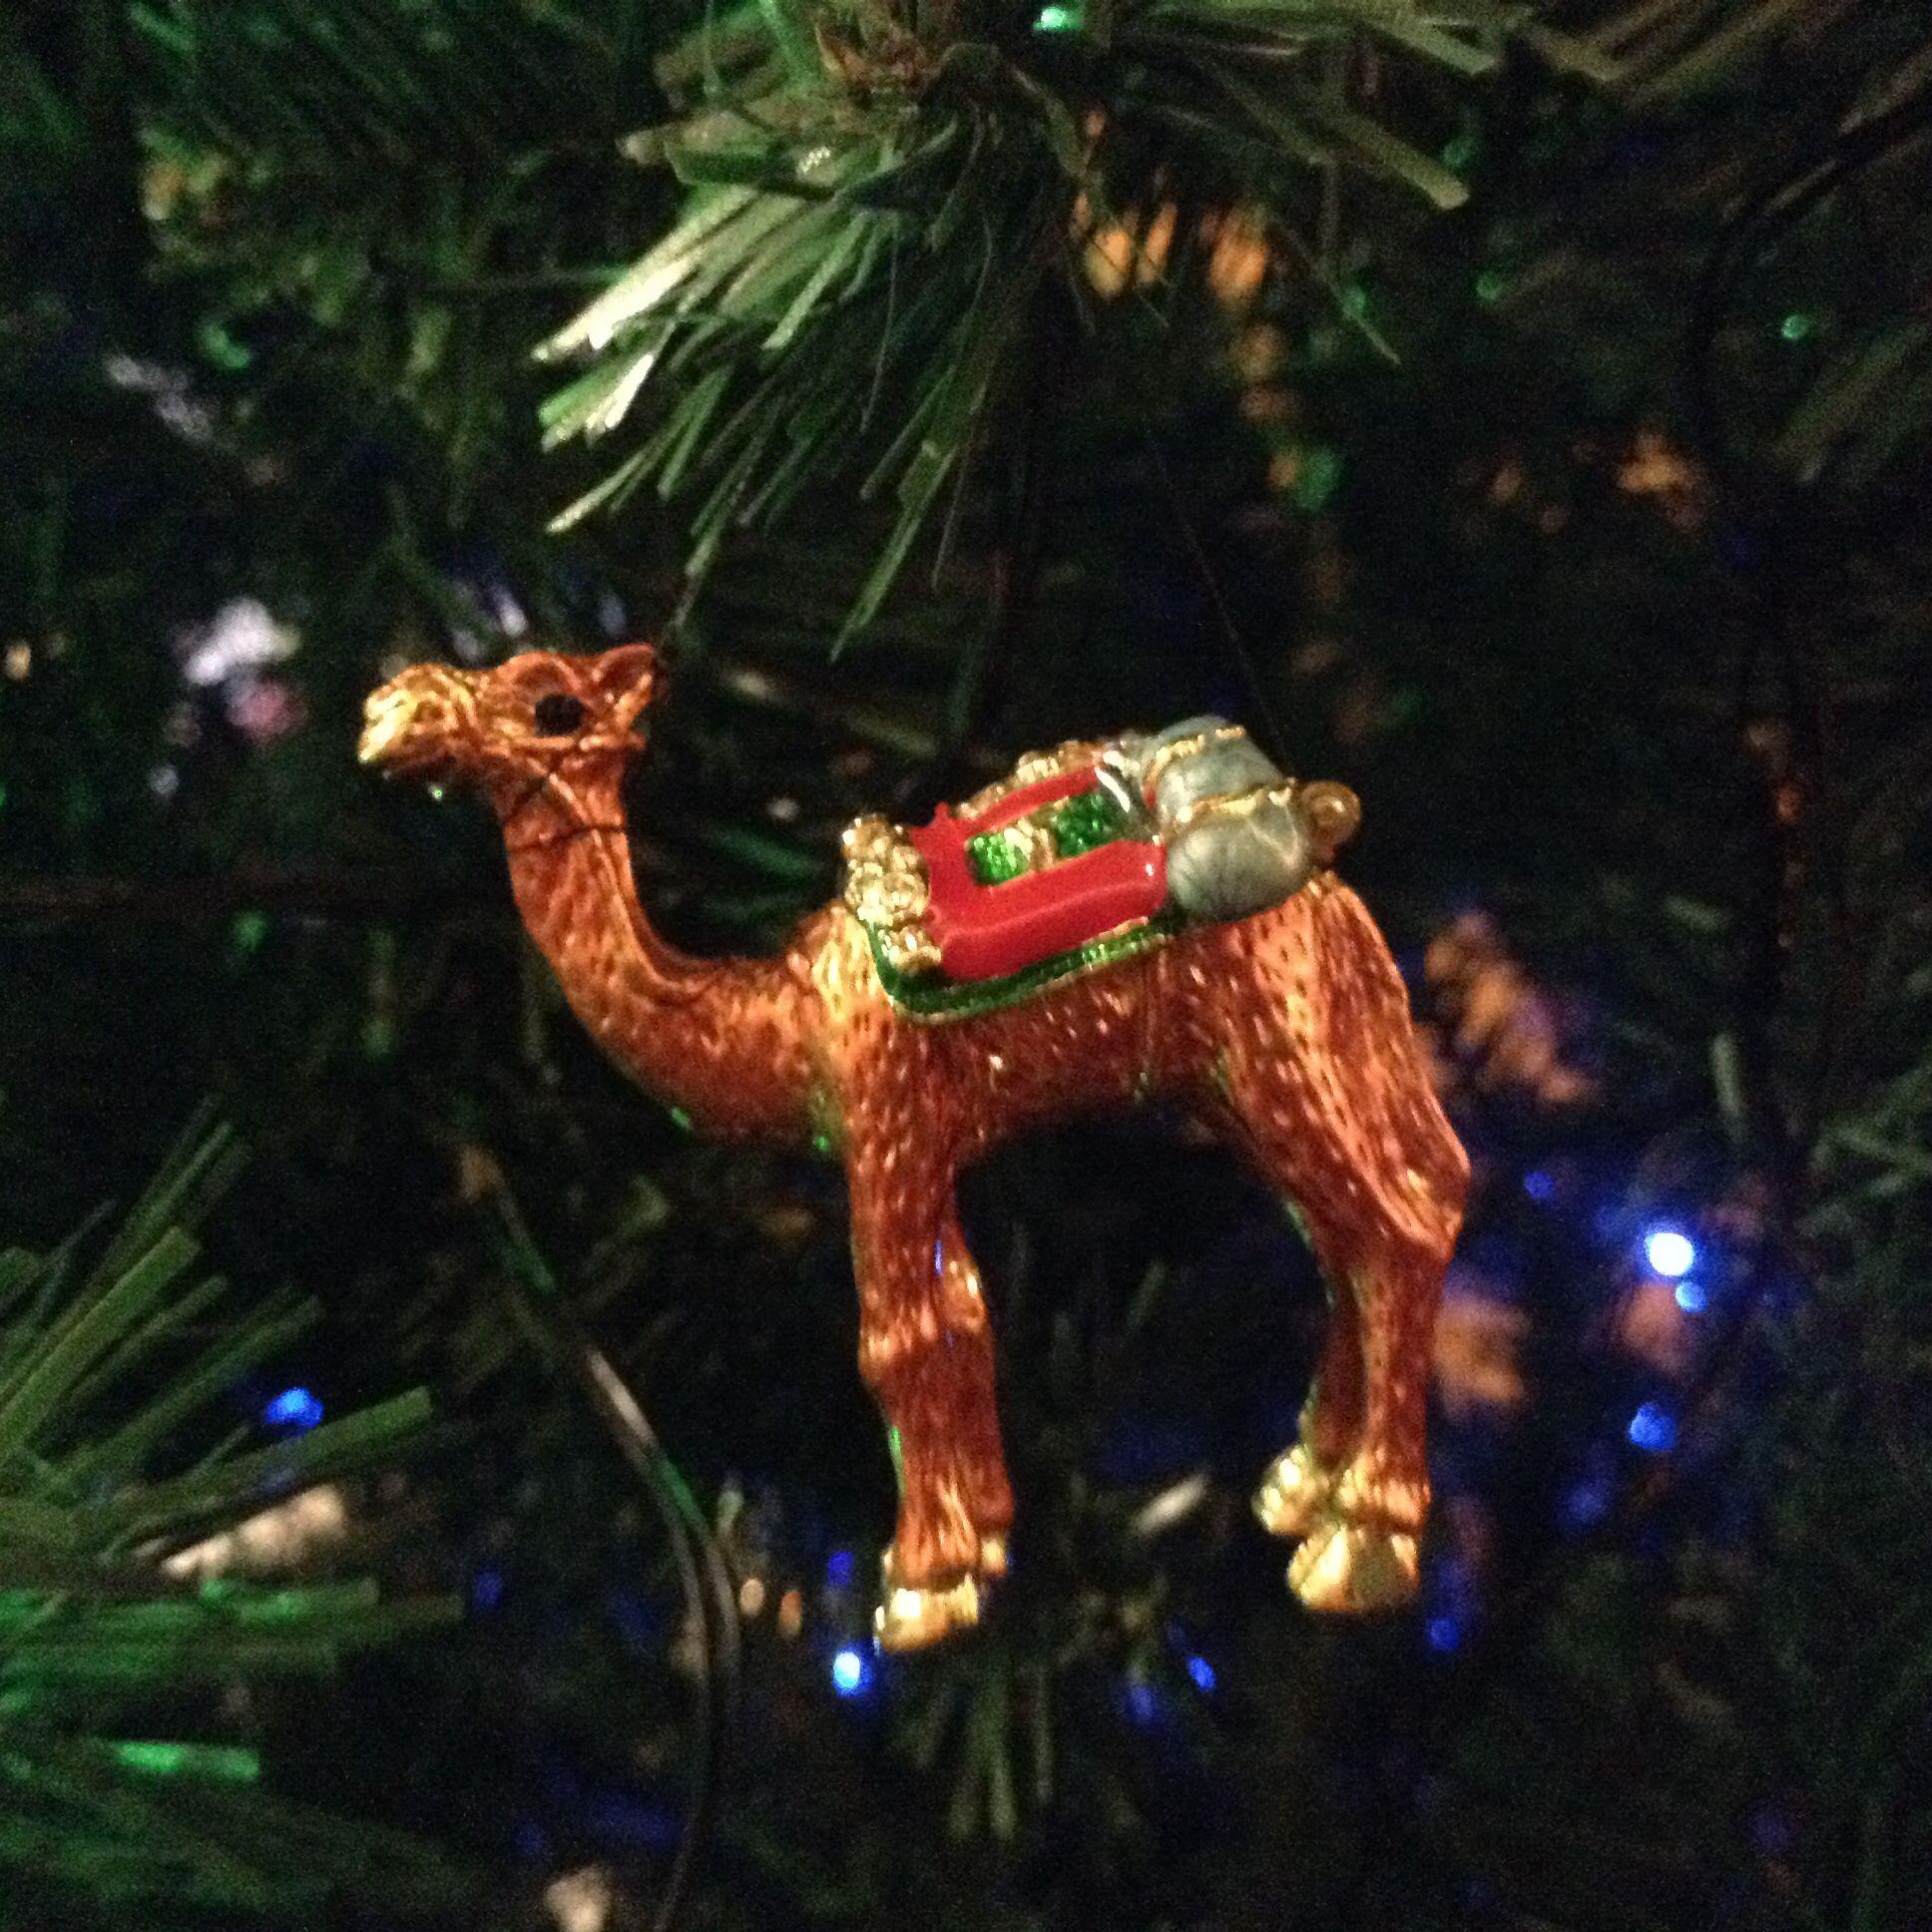 Dubai Uae Christmas Ornaments Holiday Decor Novelty Christmas